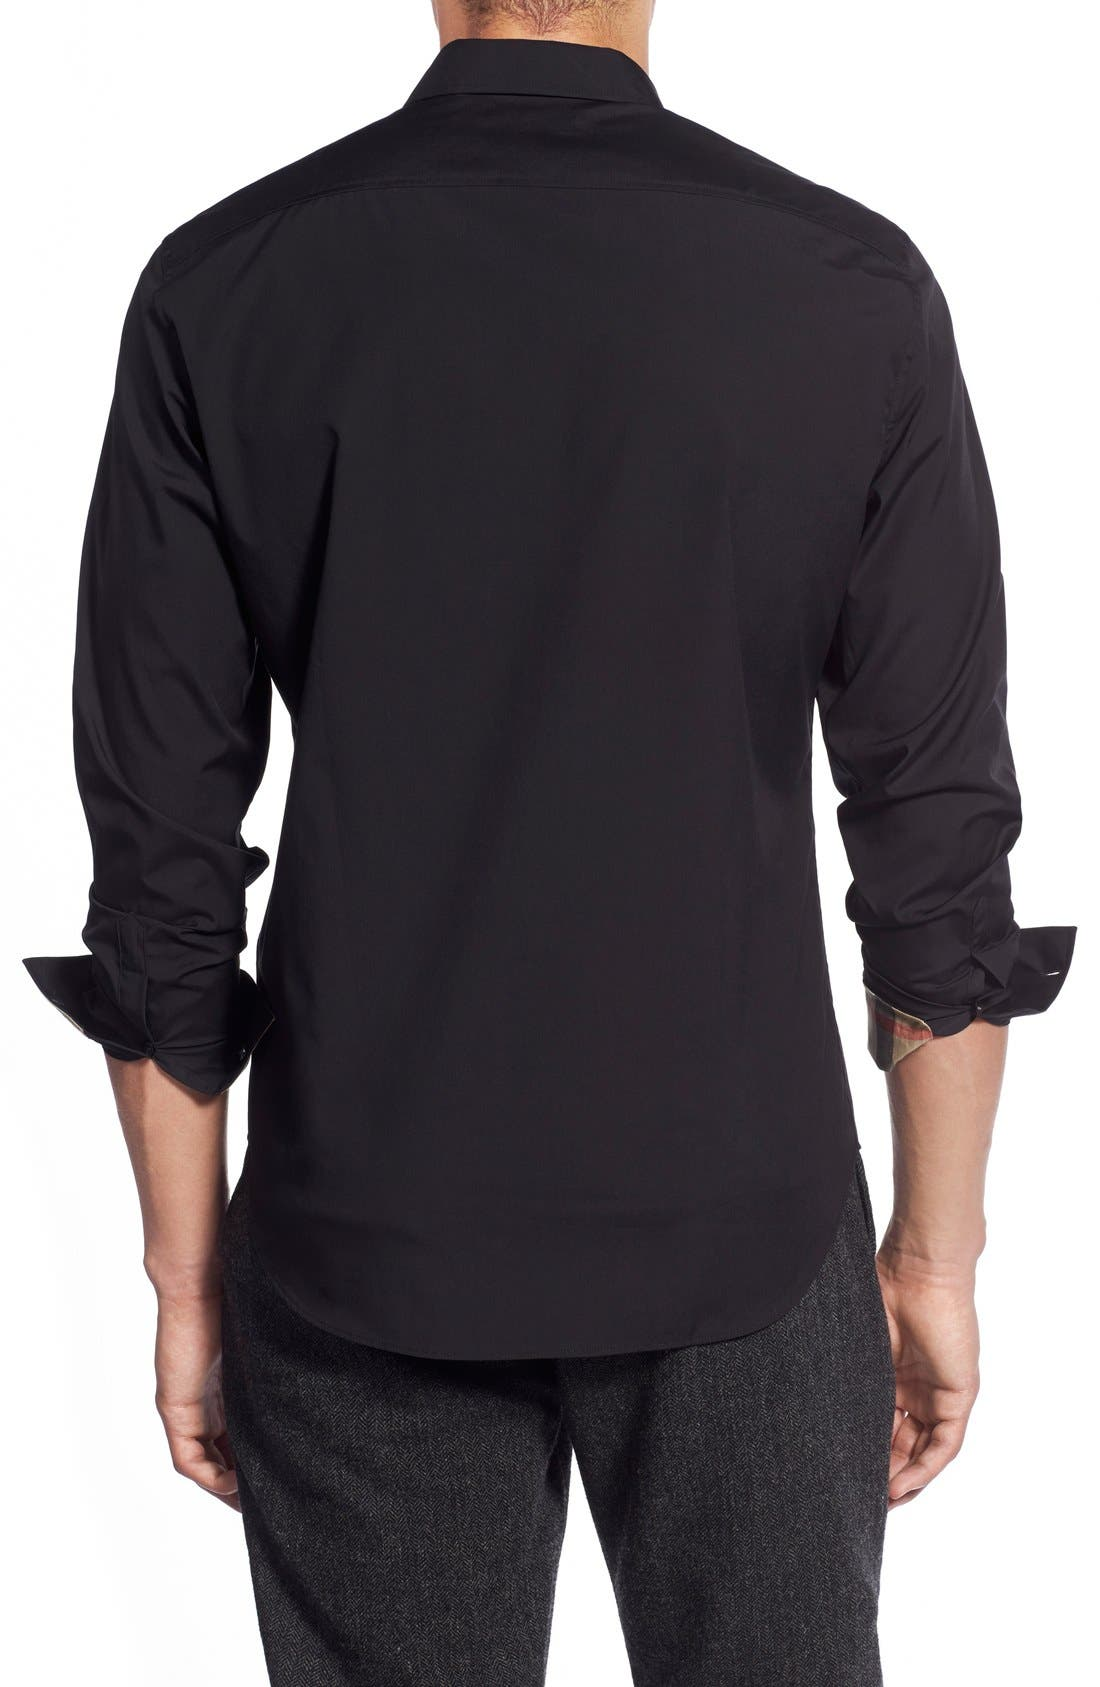 Mens Shirts  Cheap Mens Shirts  MandM Direct